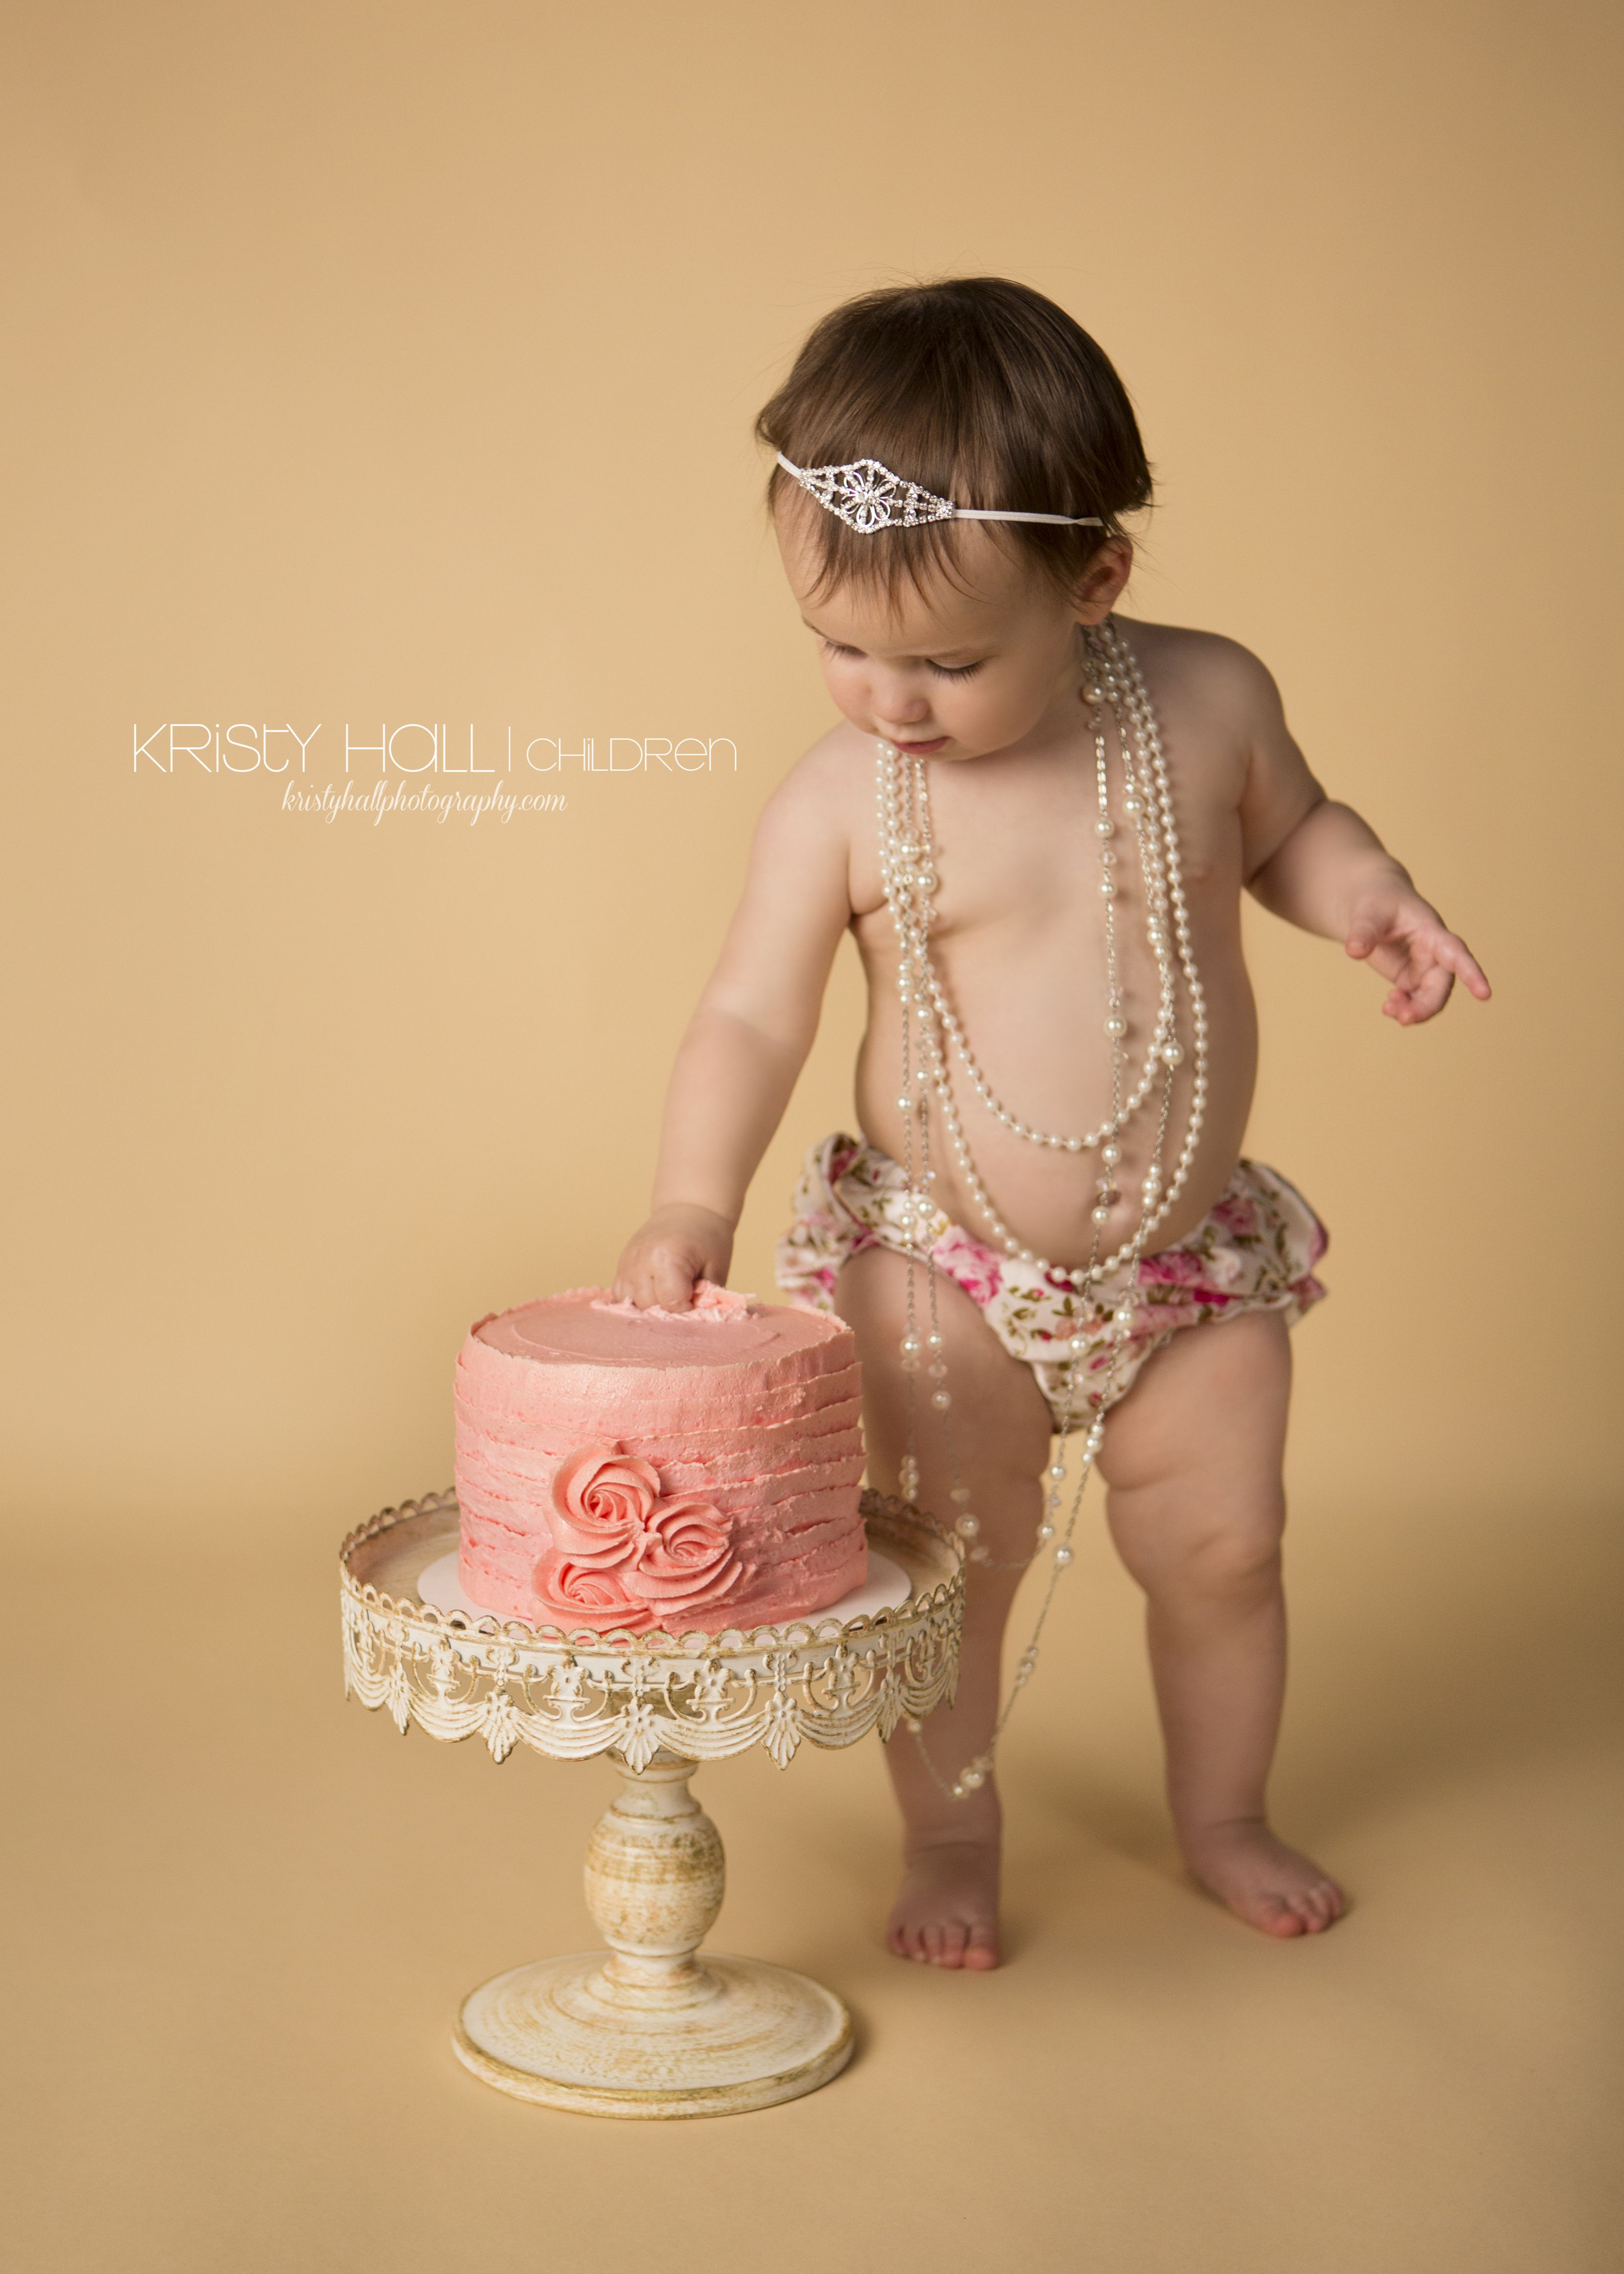 Pin by Jennifer Marie on Party Ideas | Pinterest | Cake smash ...